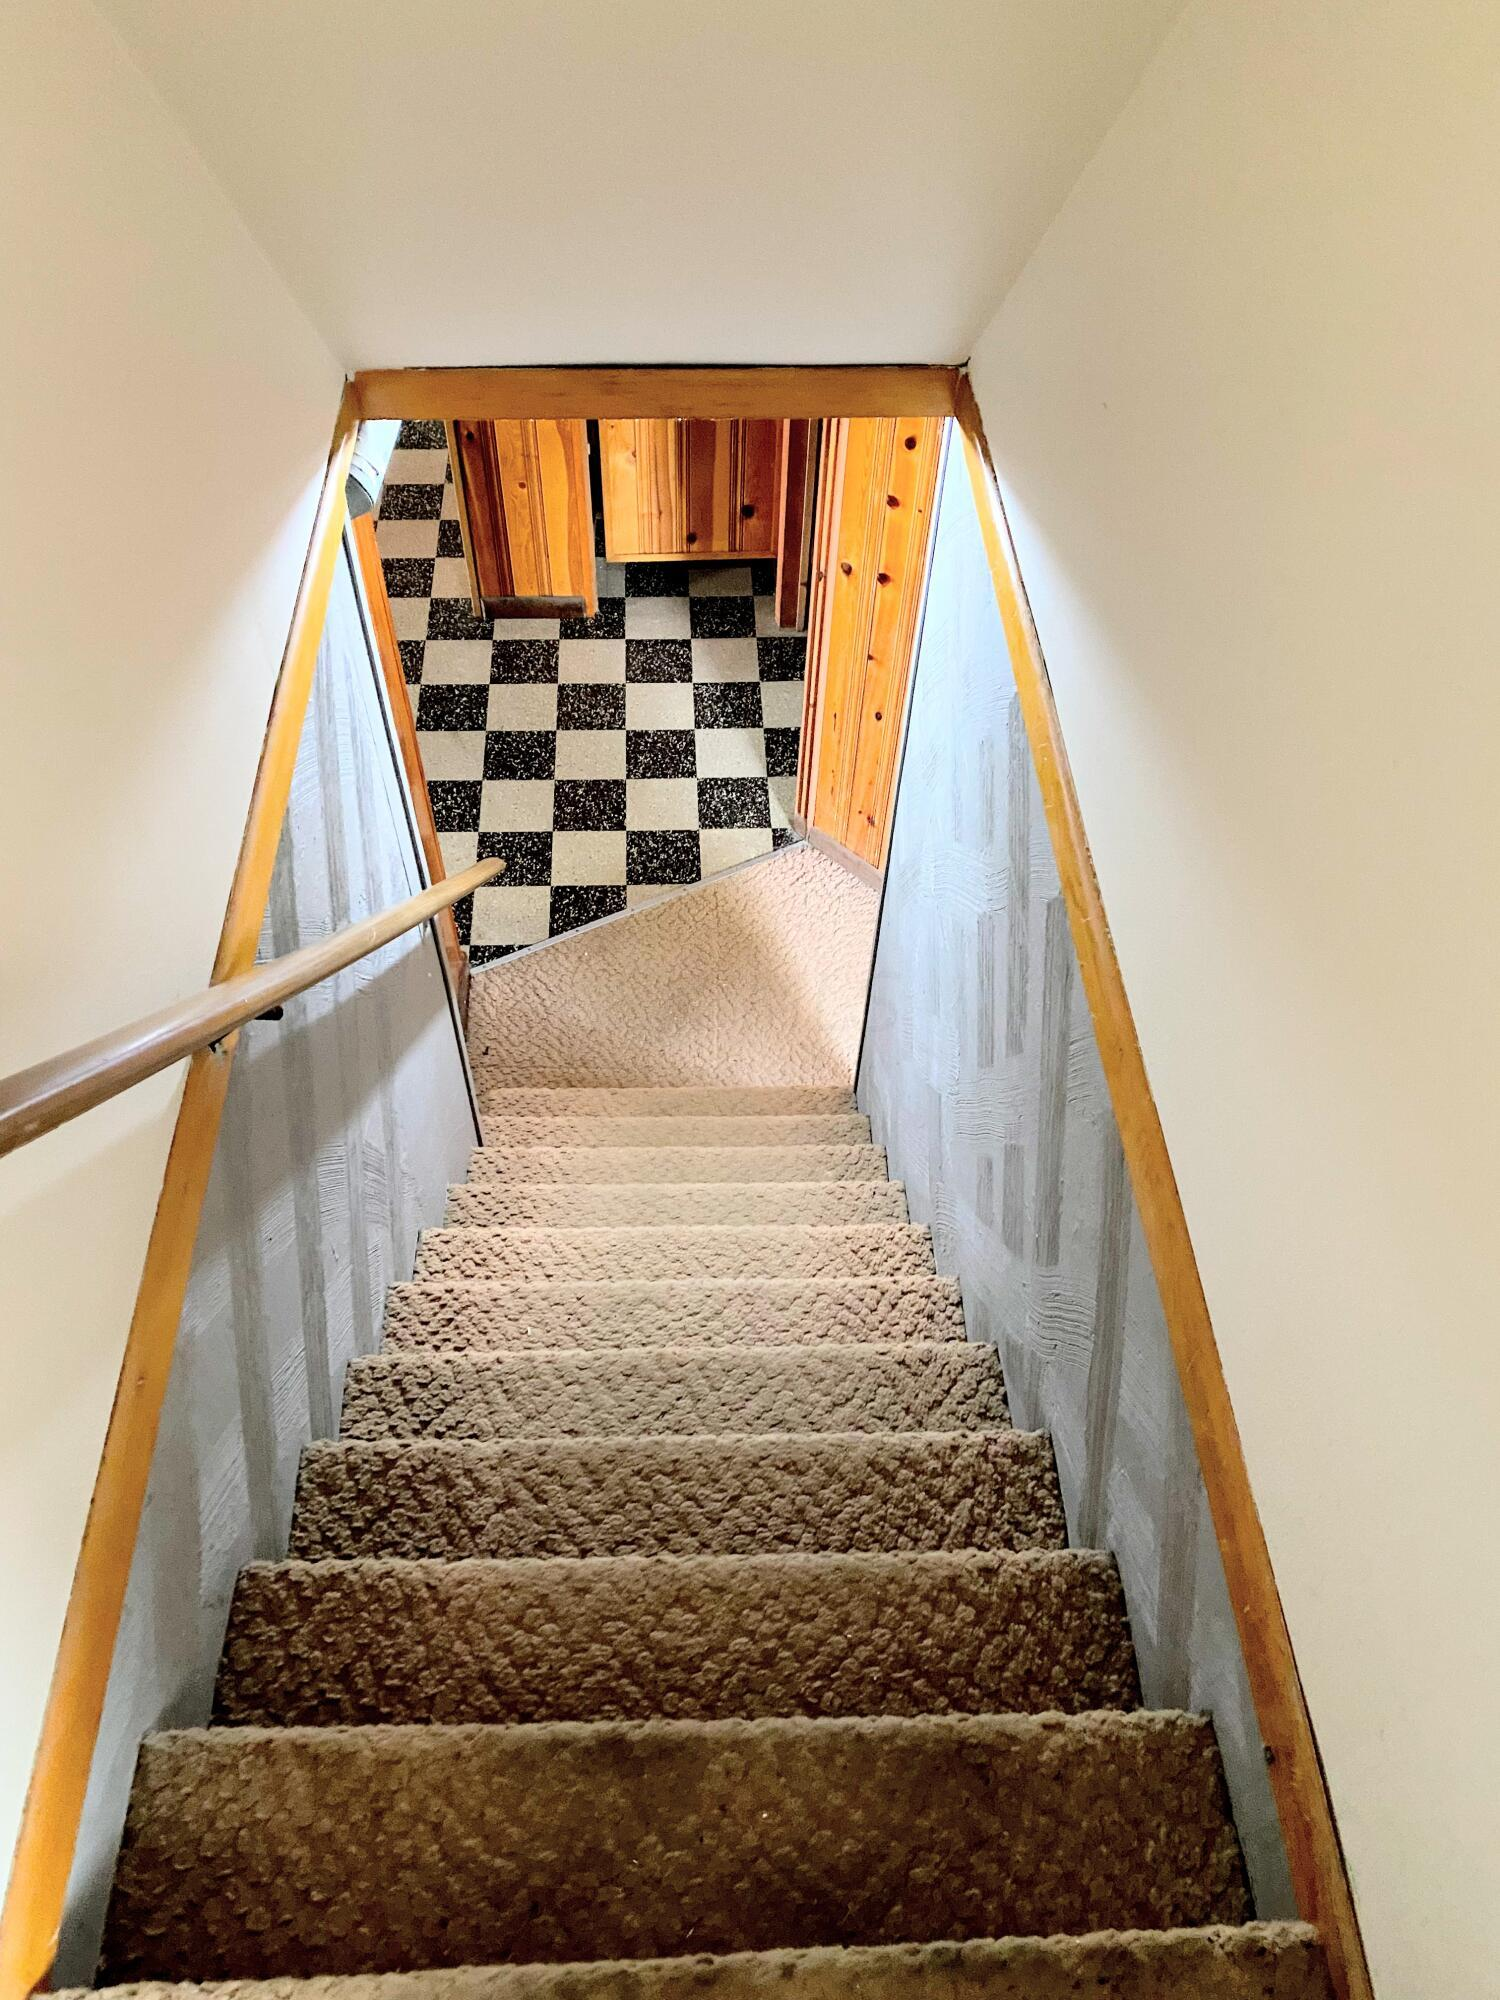 To basement